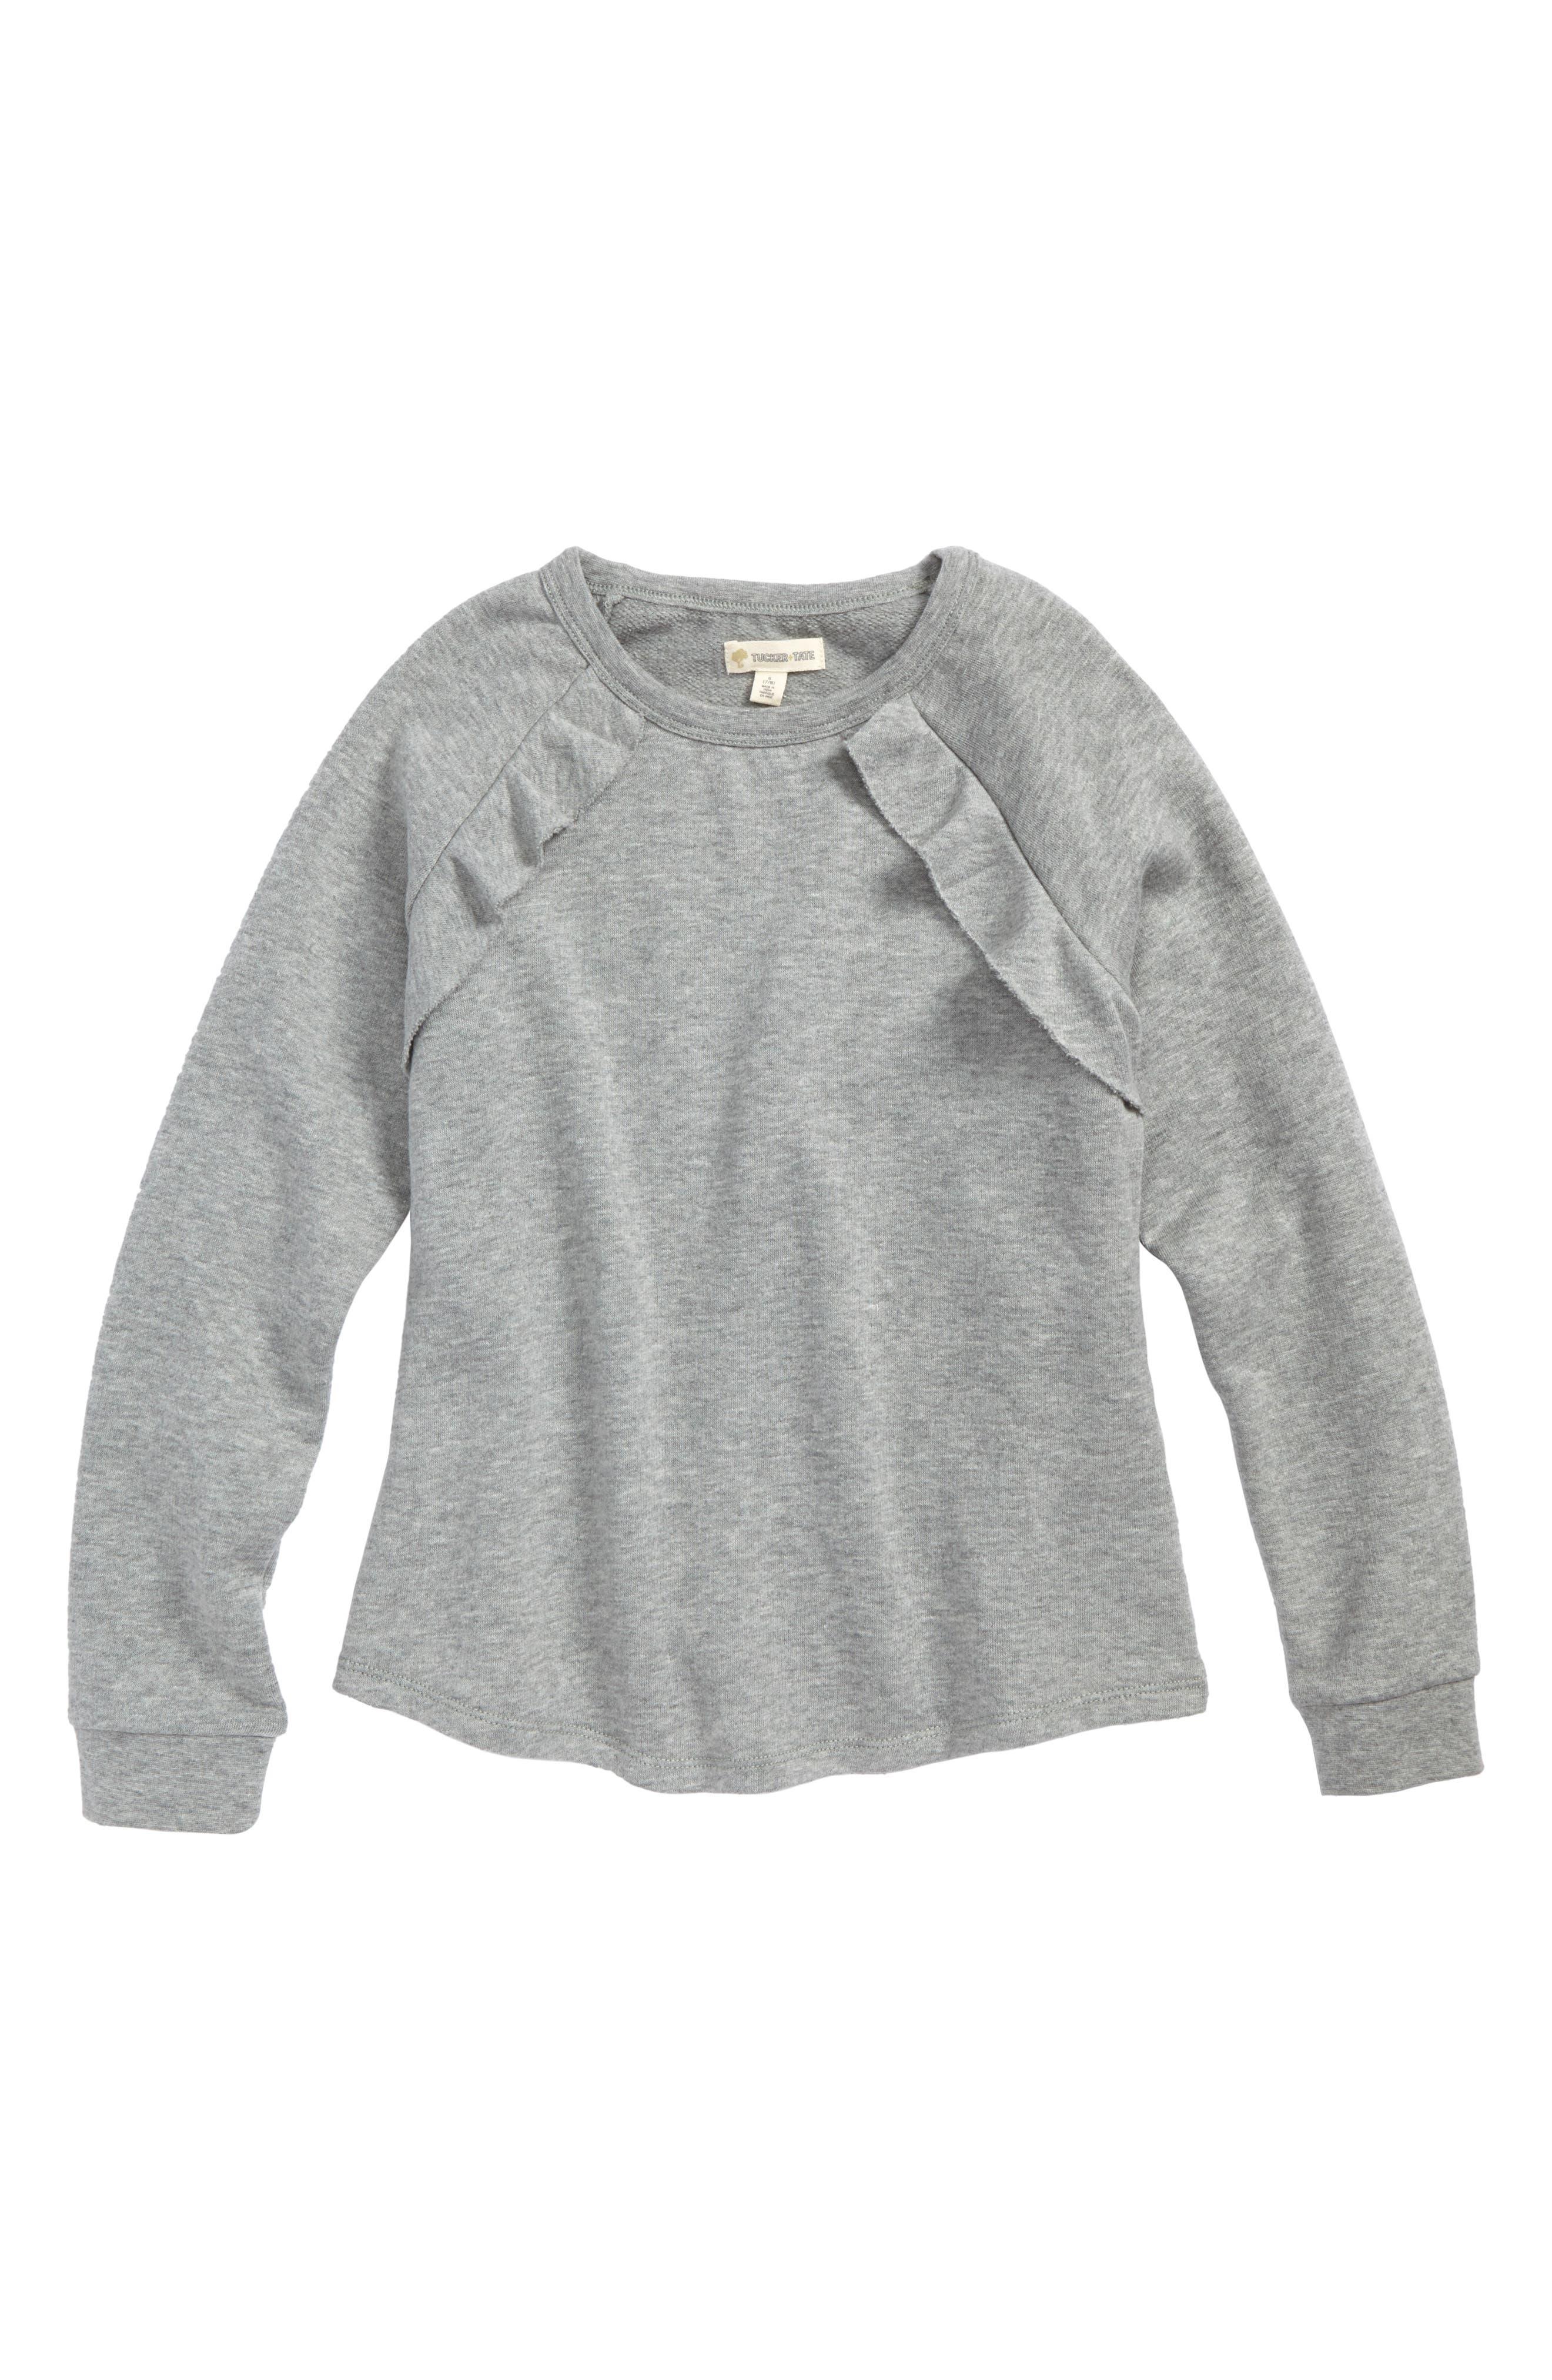 Main Image - Tucker + Tate Ruffle Fleece Sweatshirt (Big Girls)